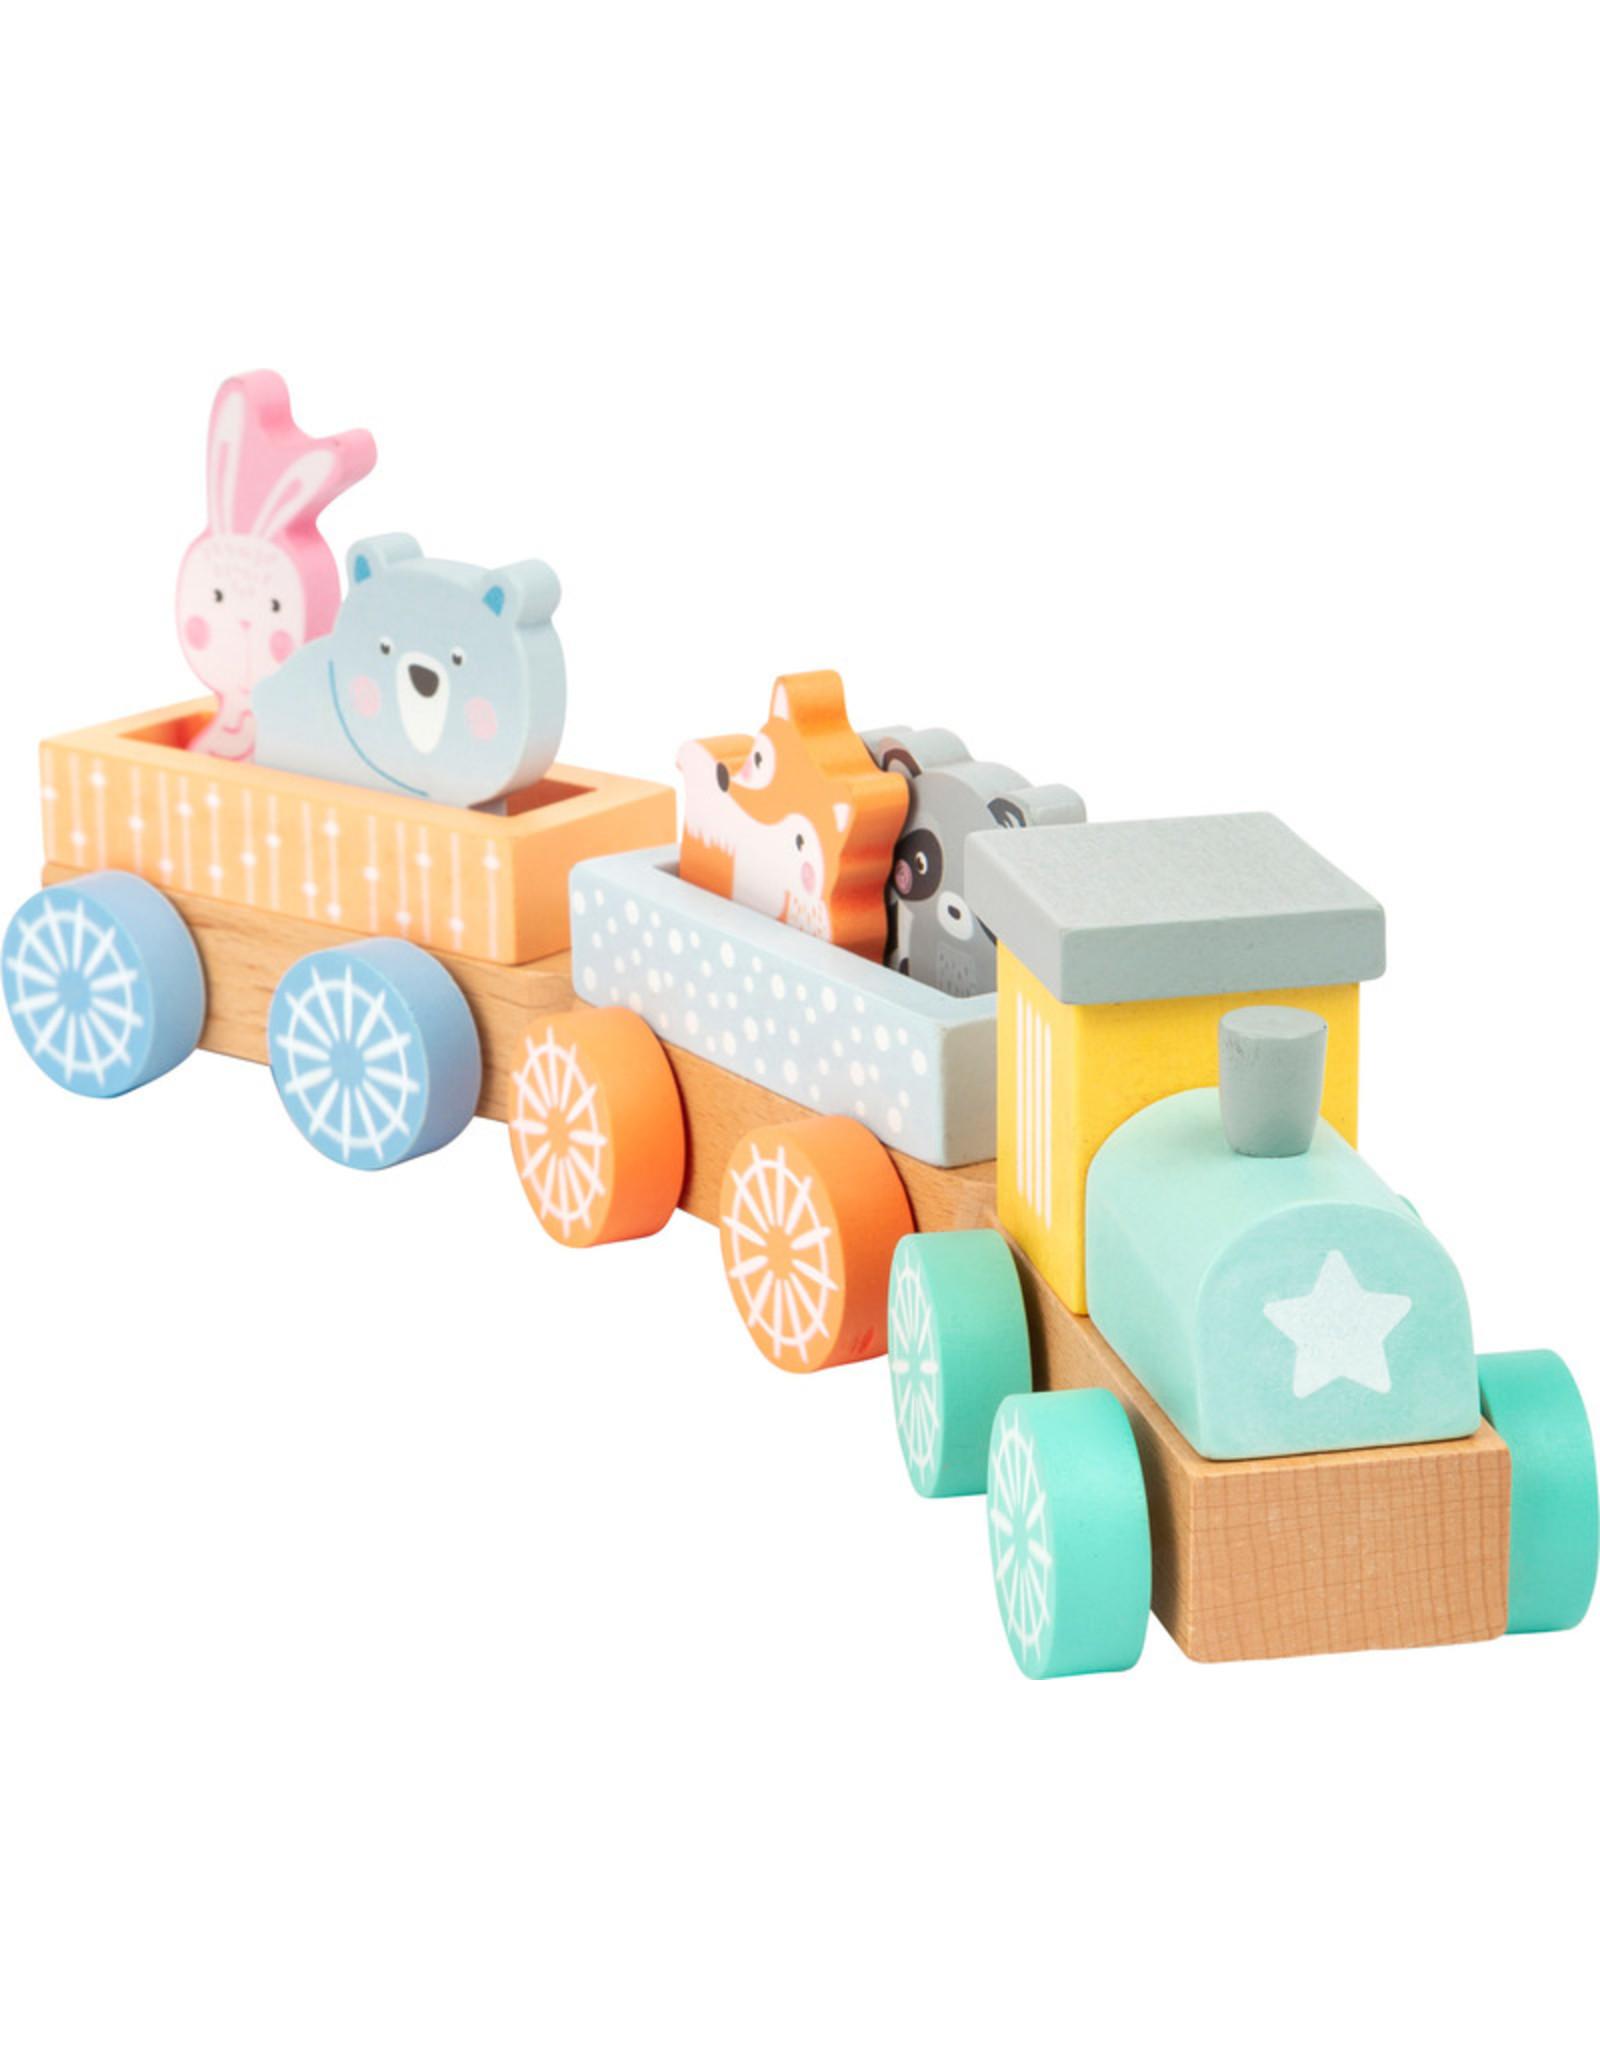 Small Foot Houten trein in pastel kleuren